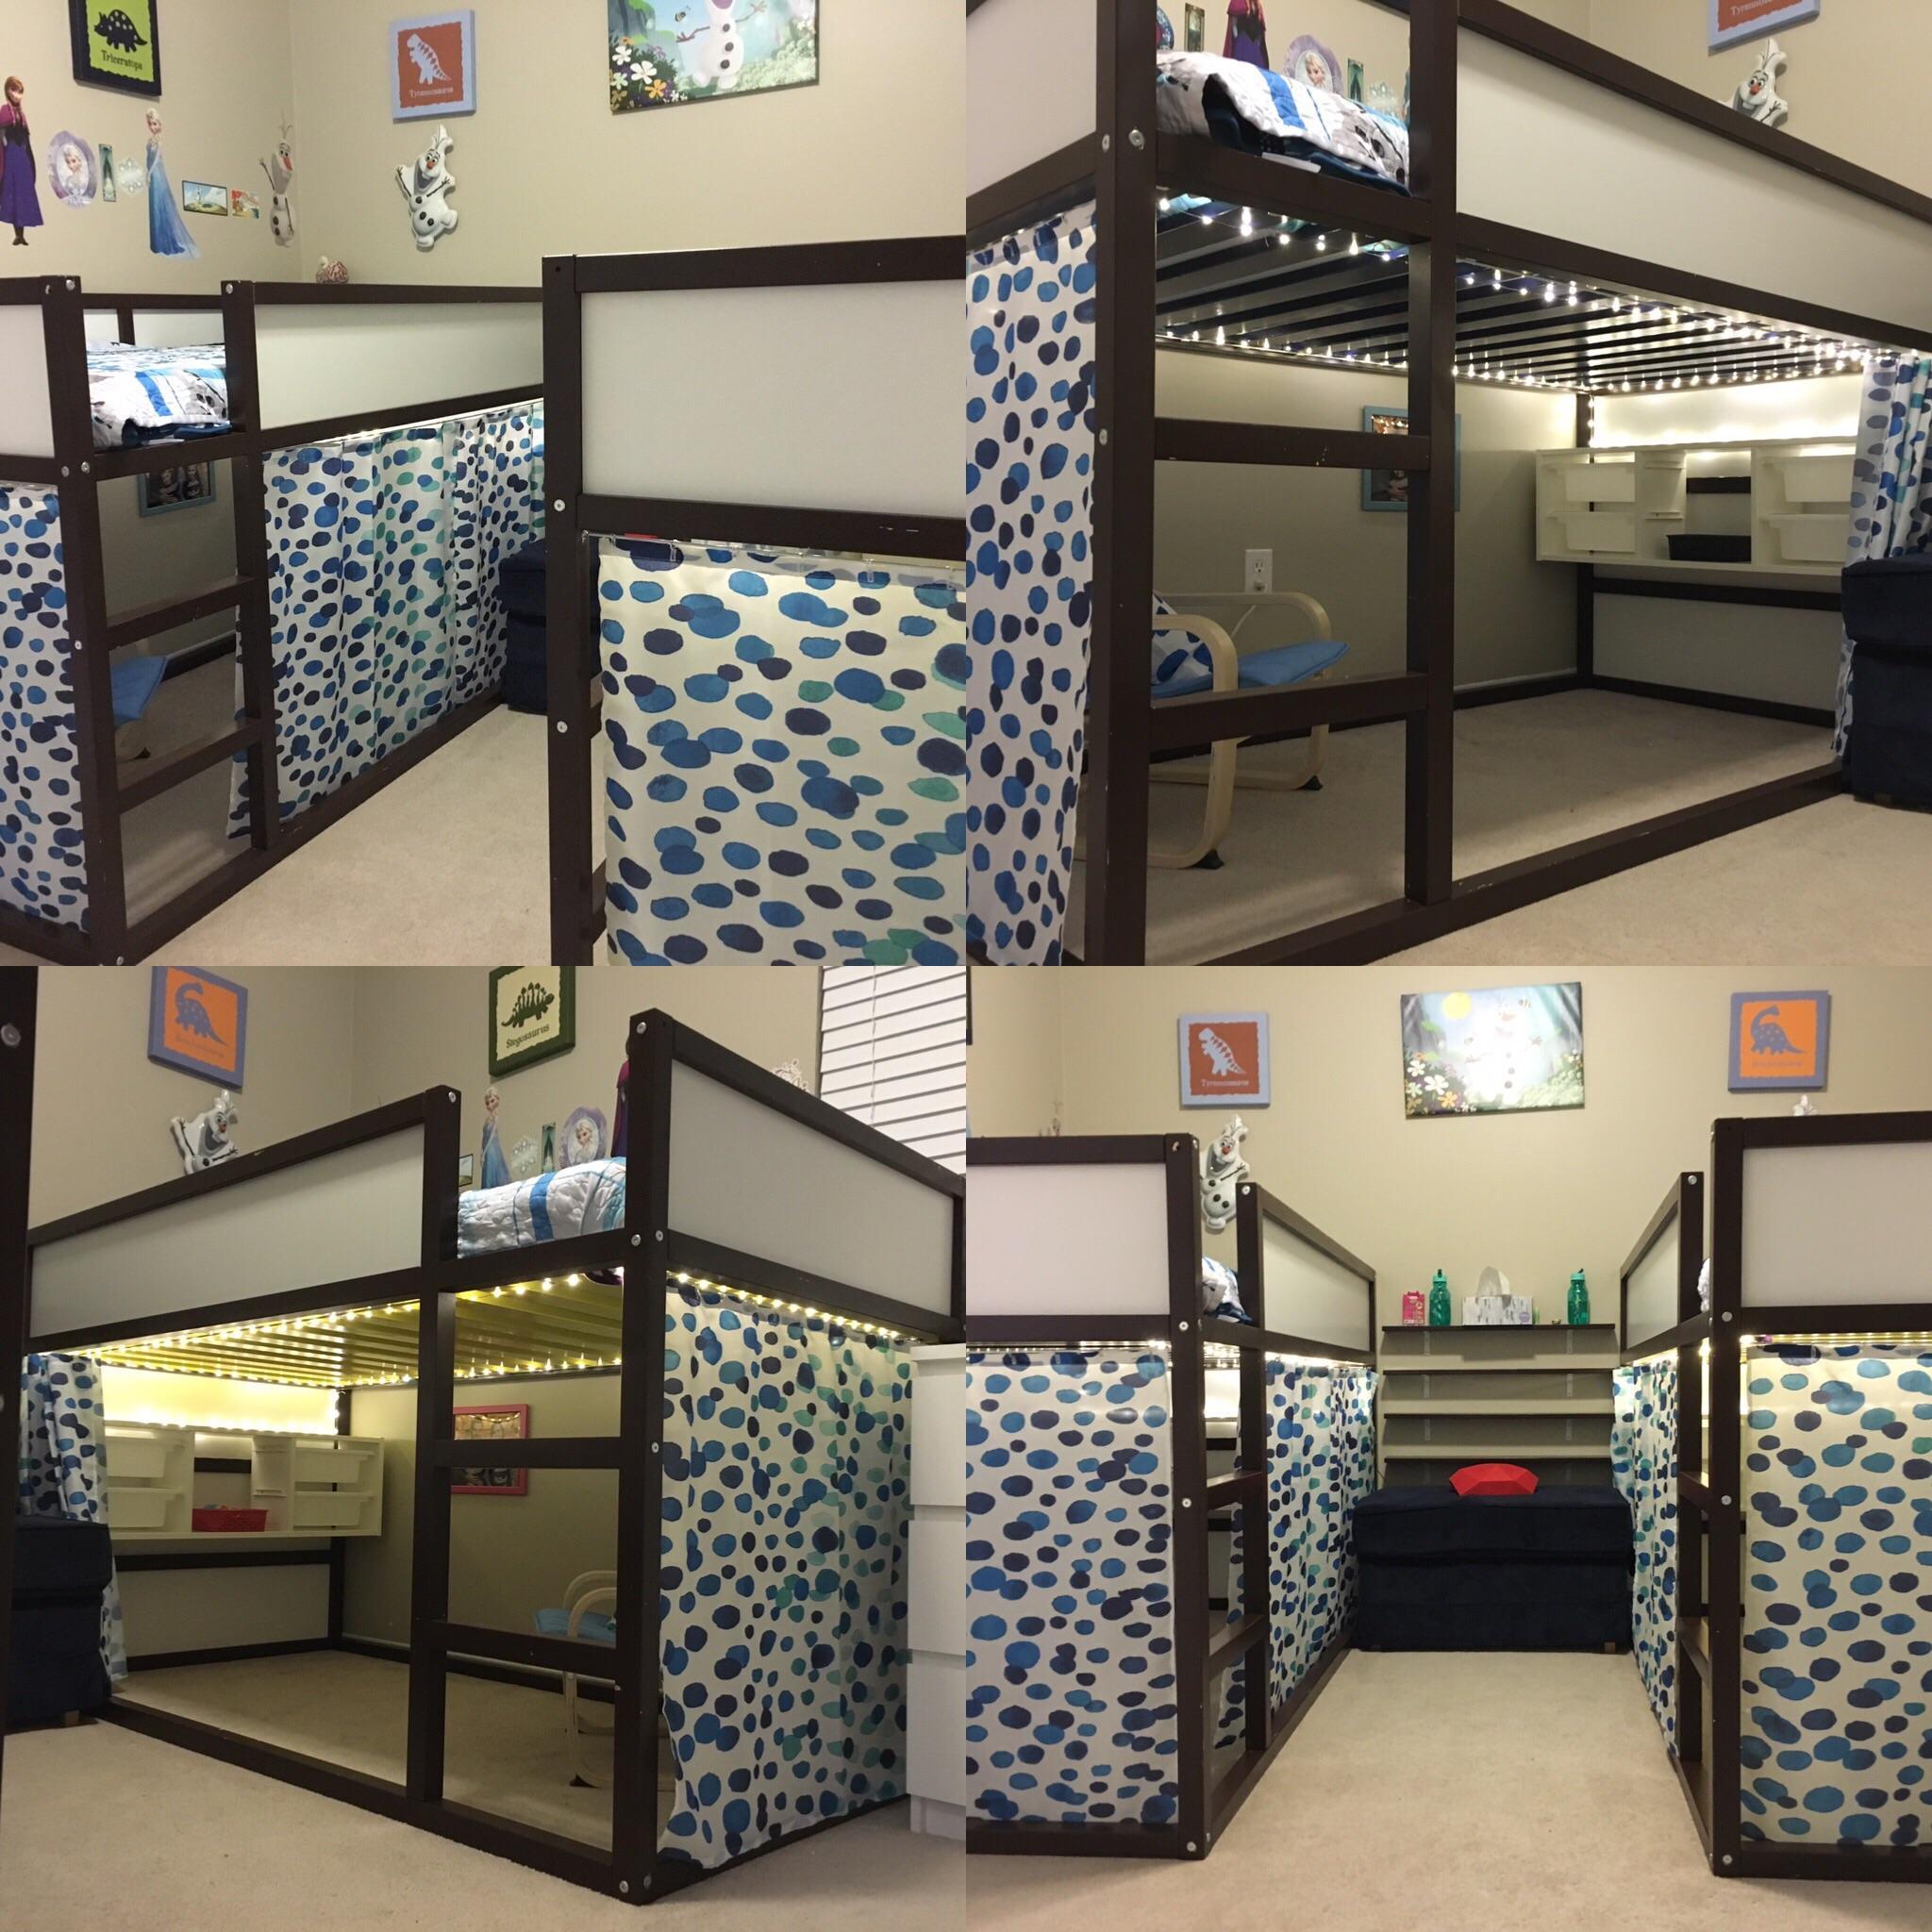 Full Size of Ikea Kura Hack House Bed Storage Montessori Ideas Floor Double Wohnzimmer Kura Hack